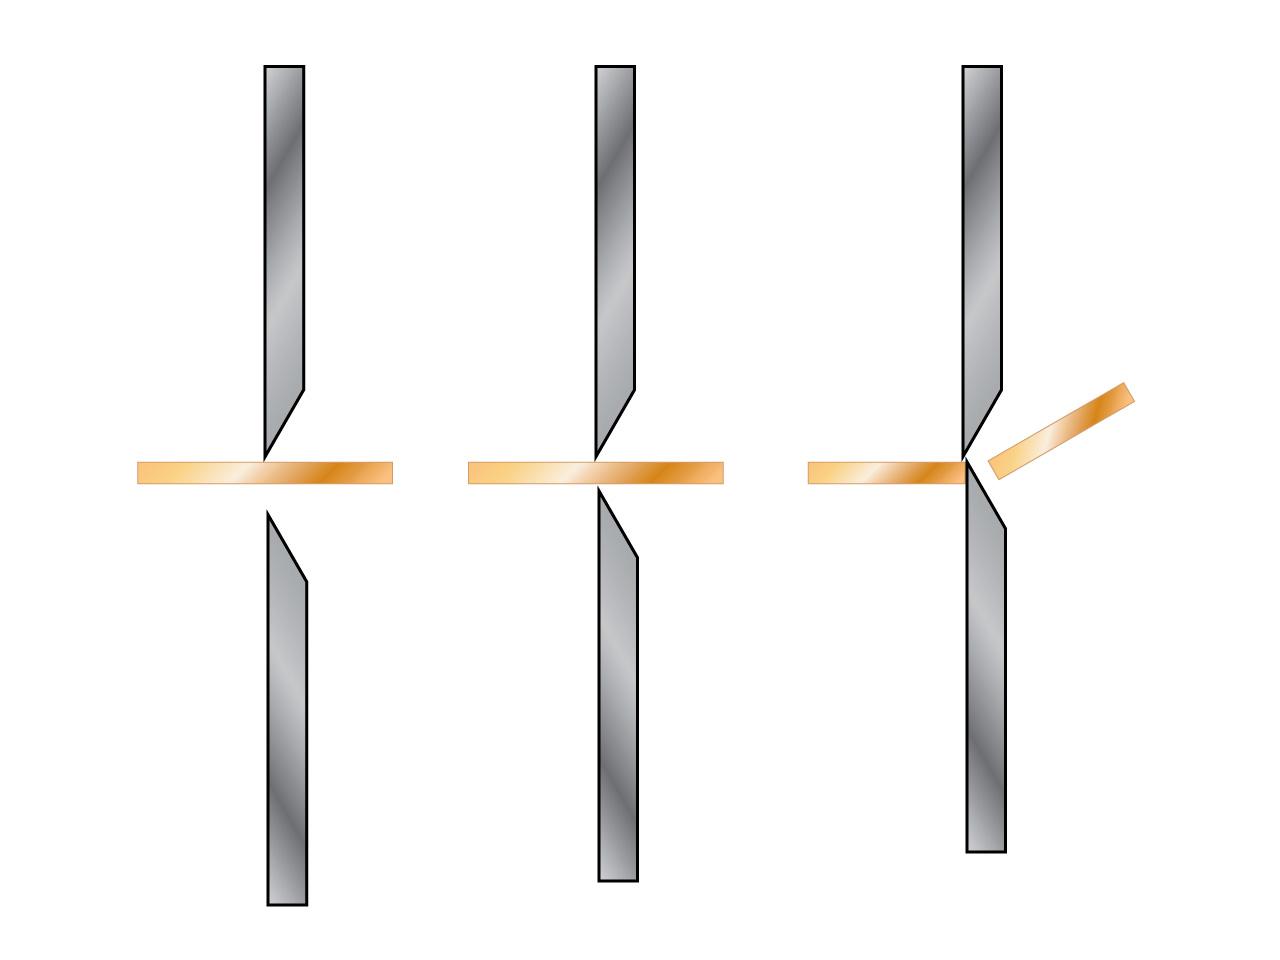 Xuron-Multi-Purpose-Pliers-Cutters-Shears-and-Scissors thumbnail 19